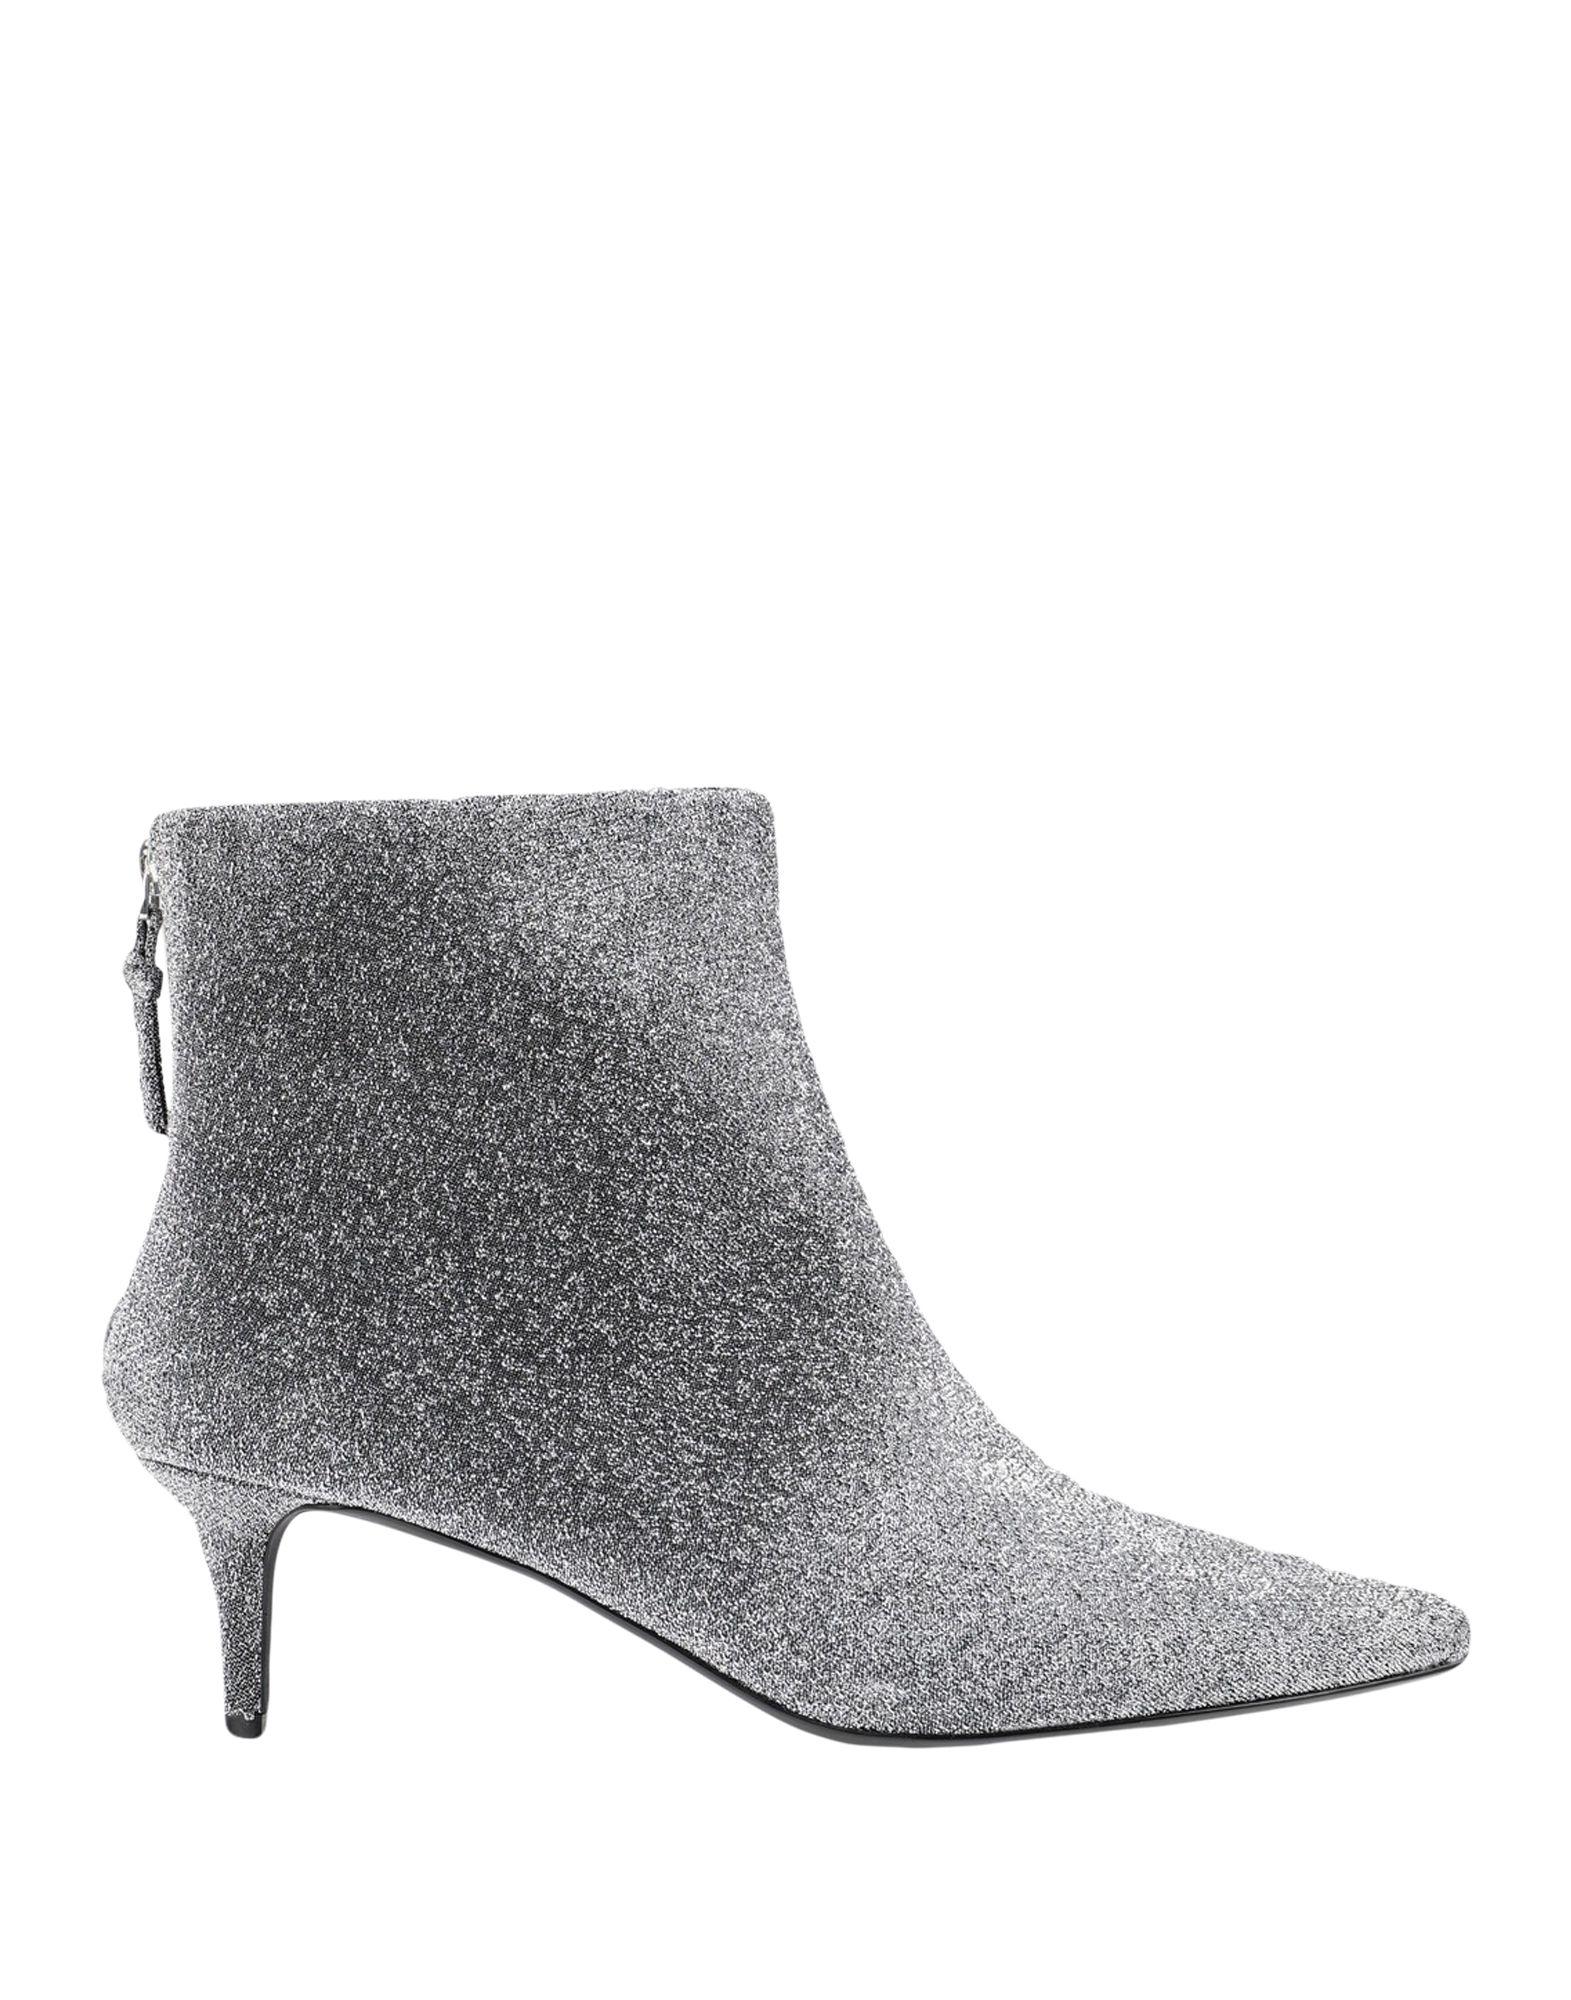 KENDALL + KYLIE Полусапоги и высокие ботинки все цены